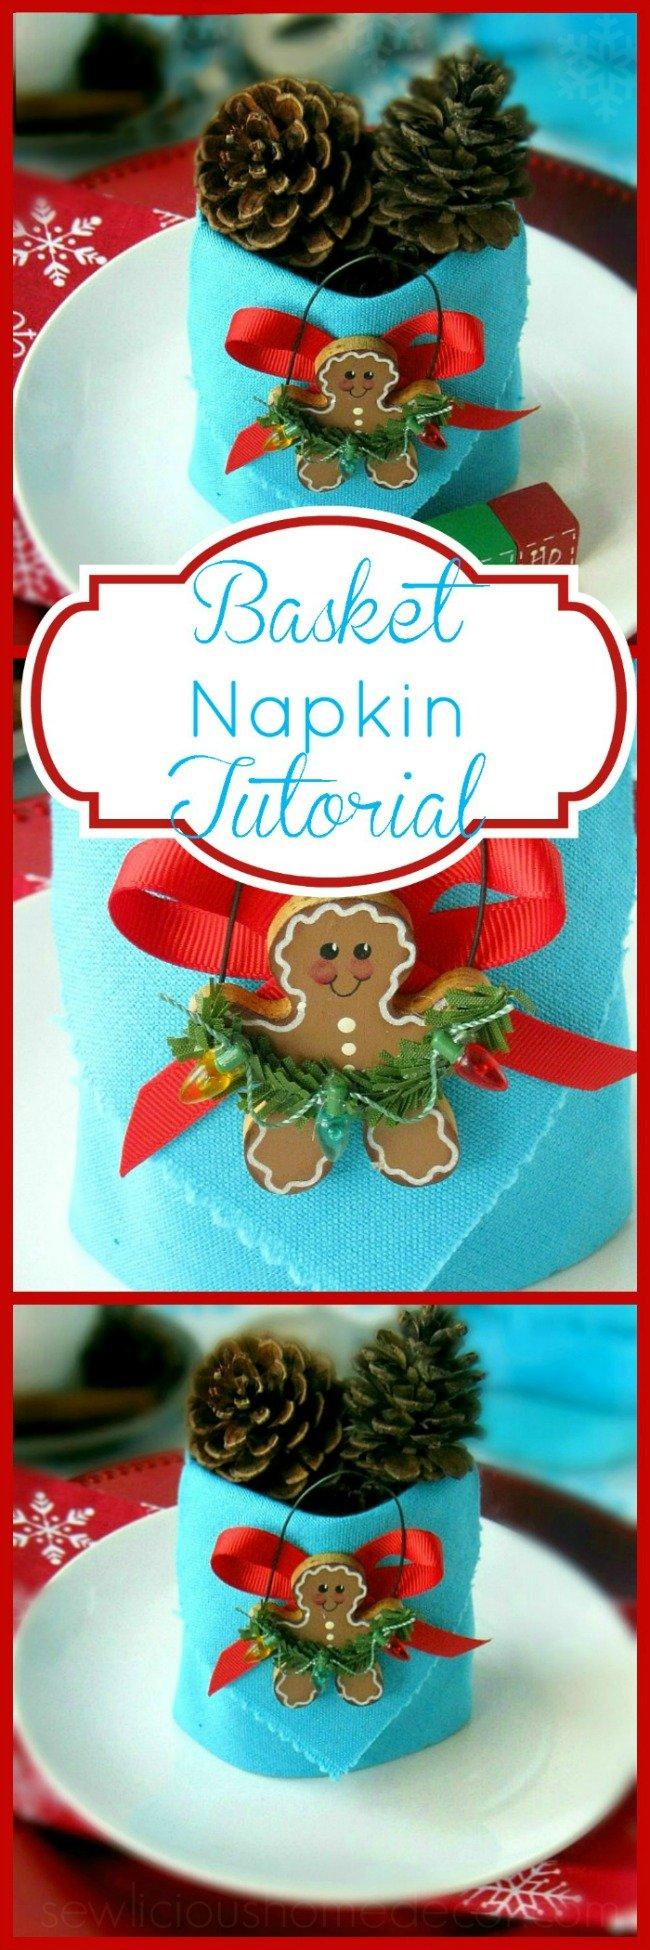 Basket Holiday Napkins